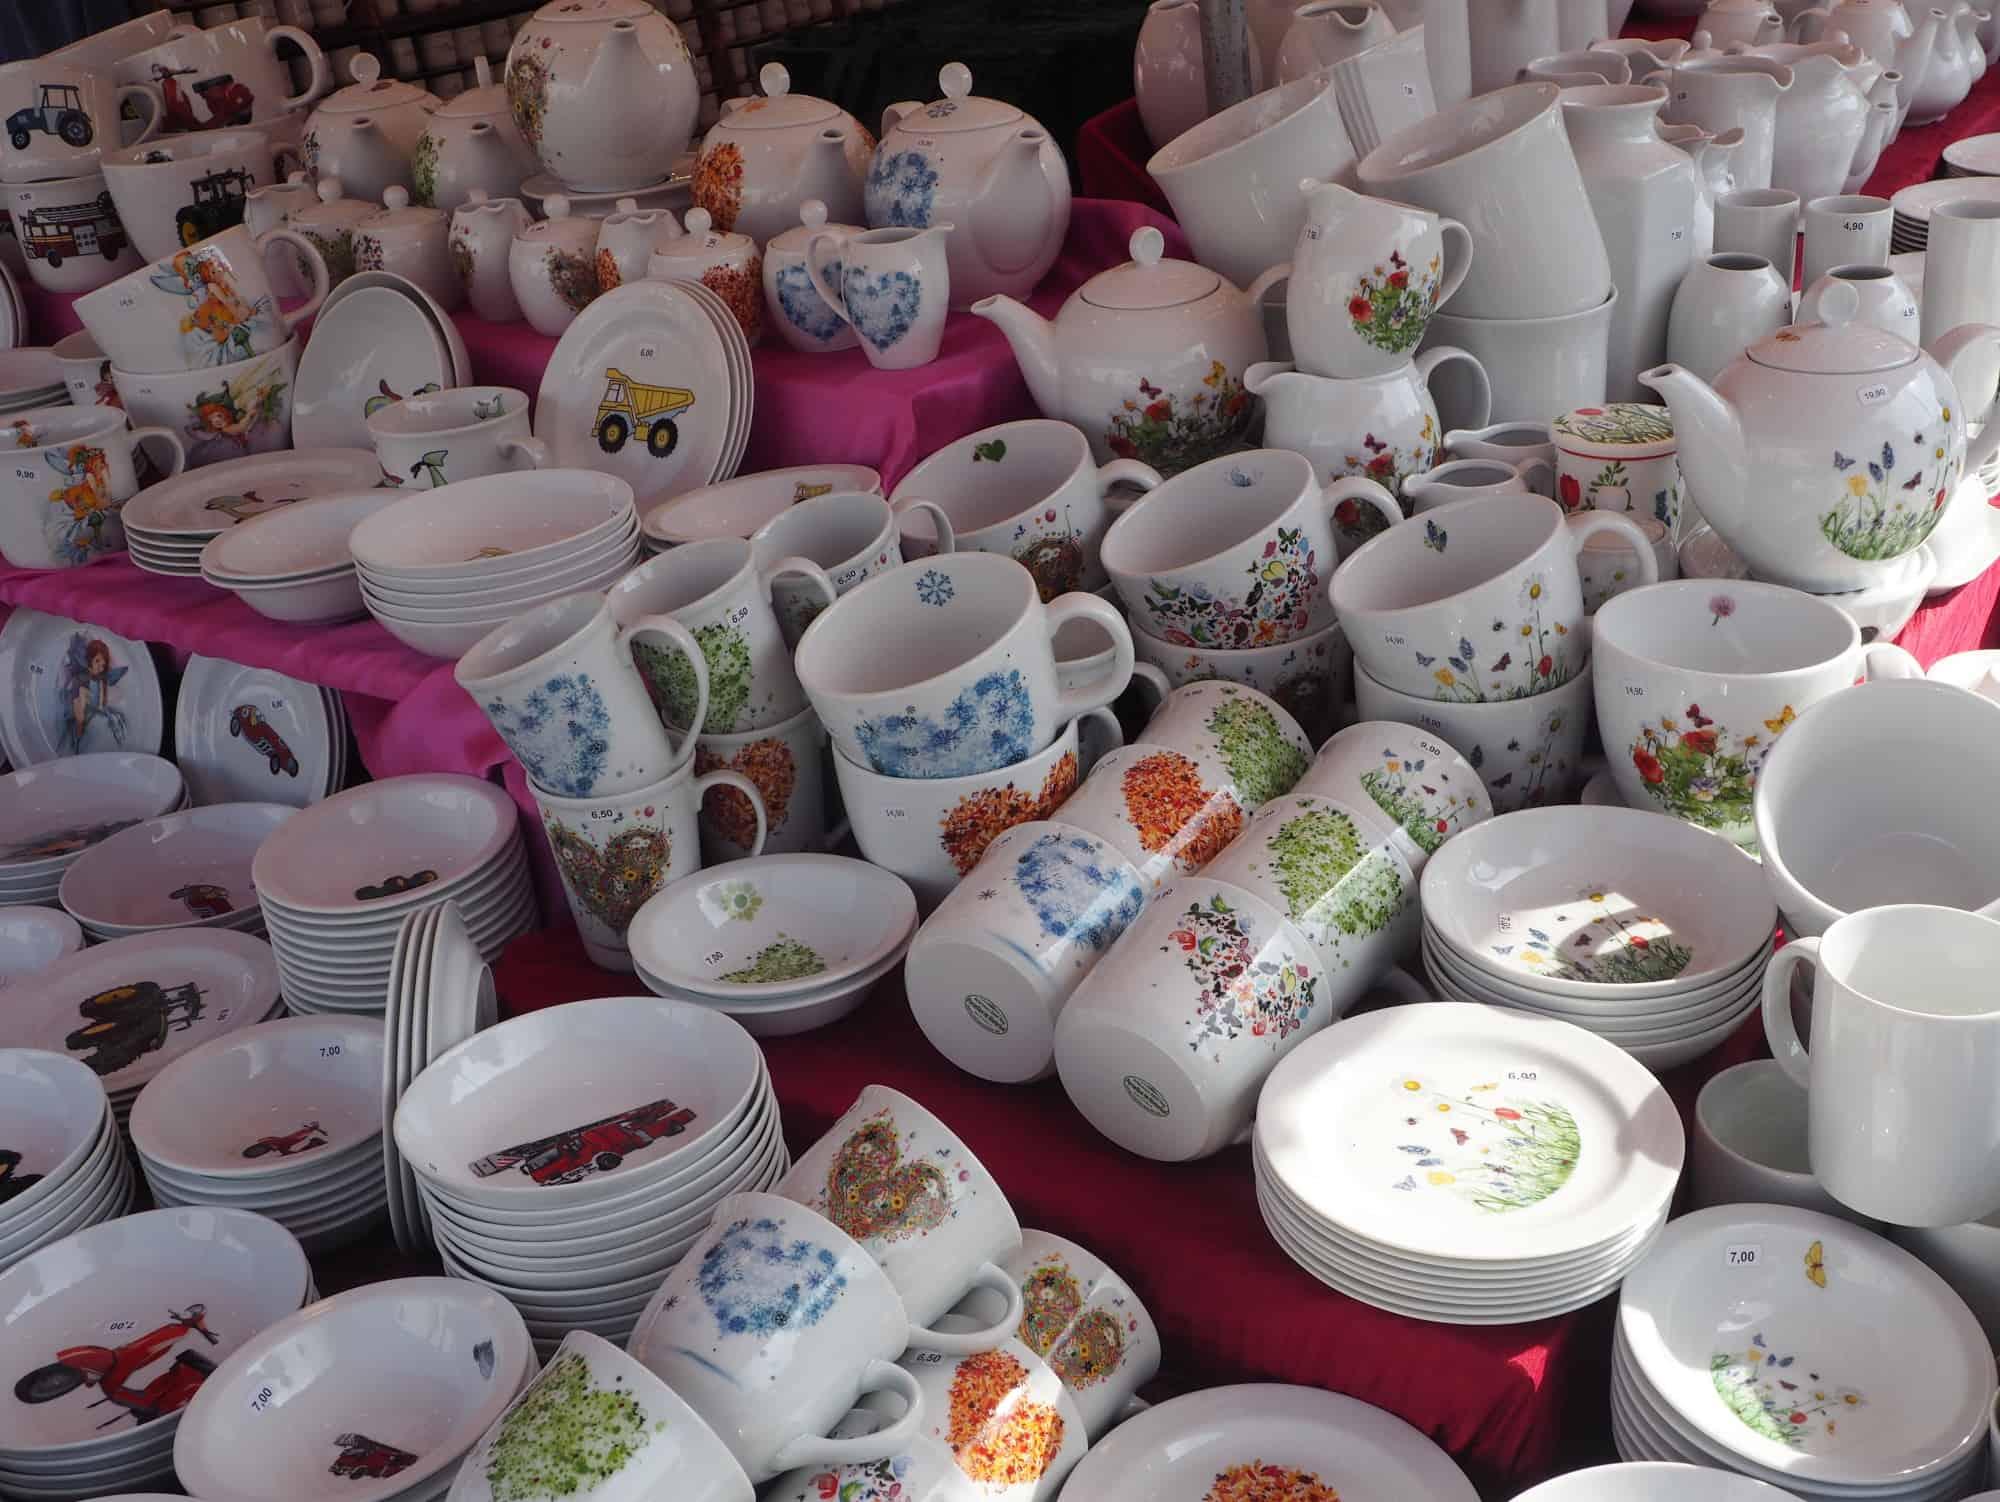 Ausschnitt Porzellanstand Ackermann- Porzellan im Hinterhof Markt Erlangen